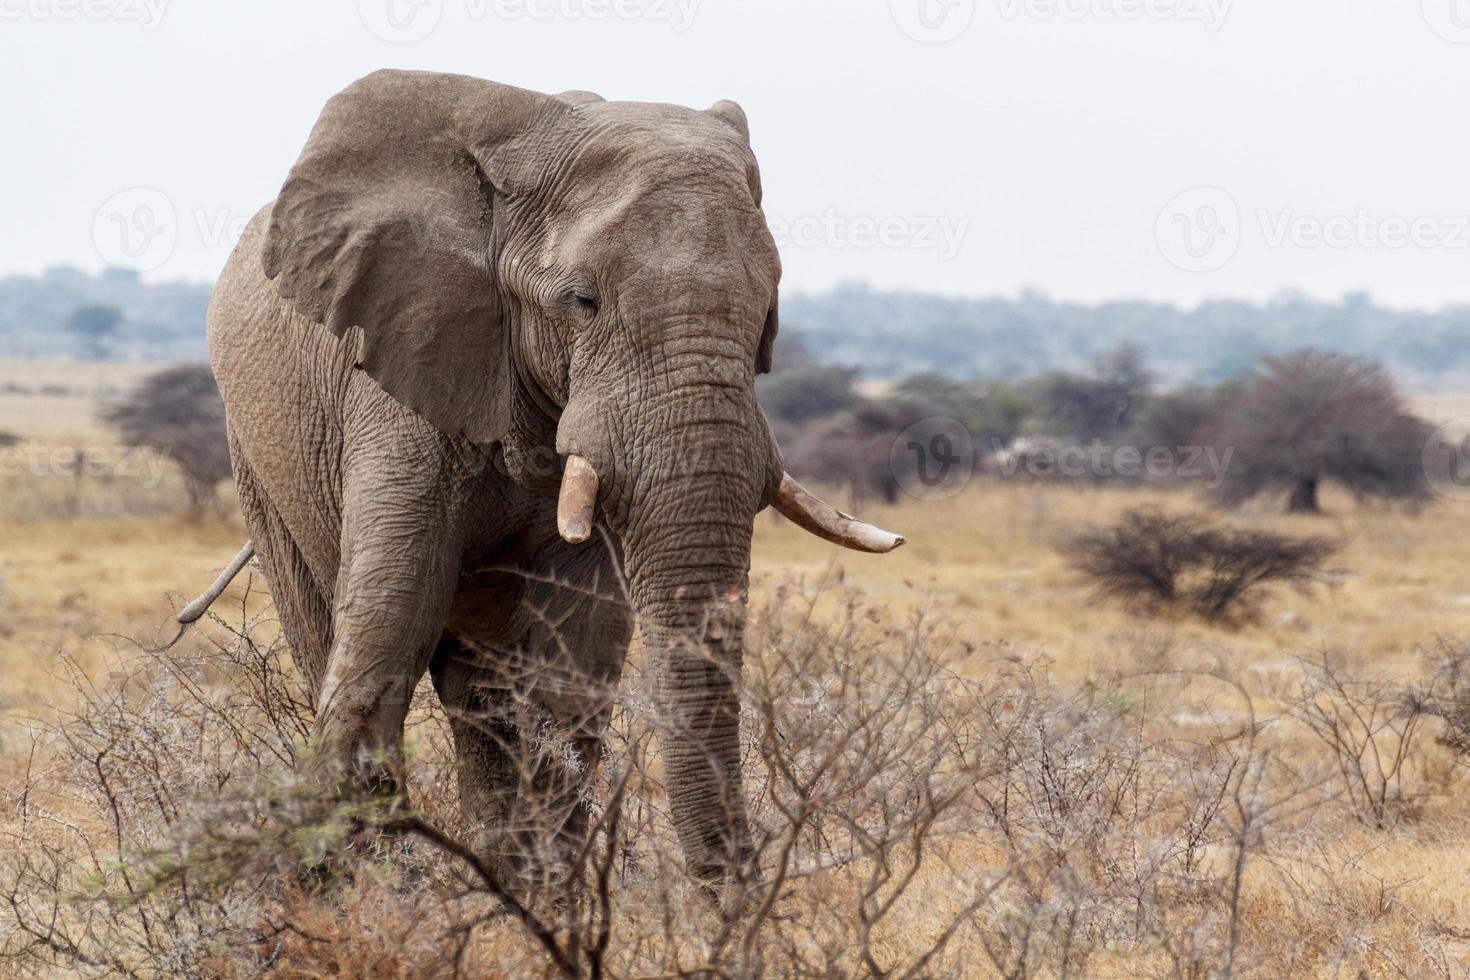 grandi elefanti africani sul parco nazionale di etosha foto